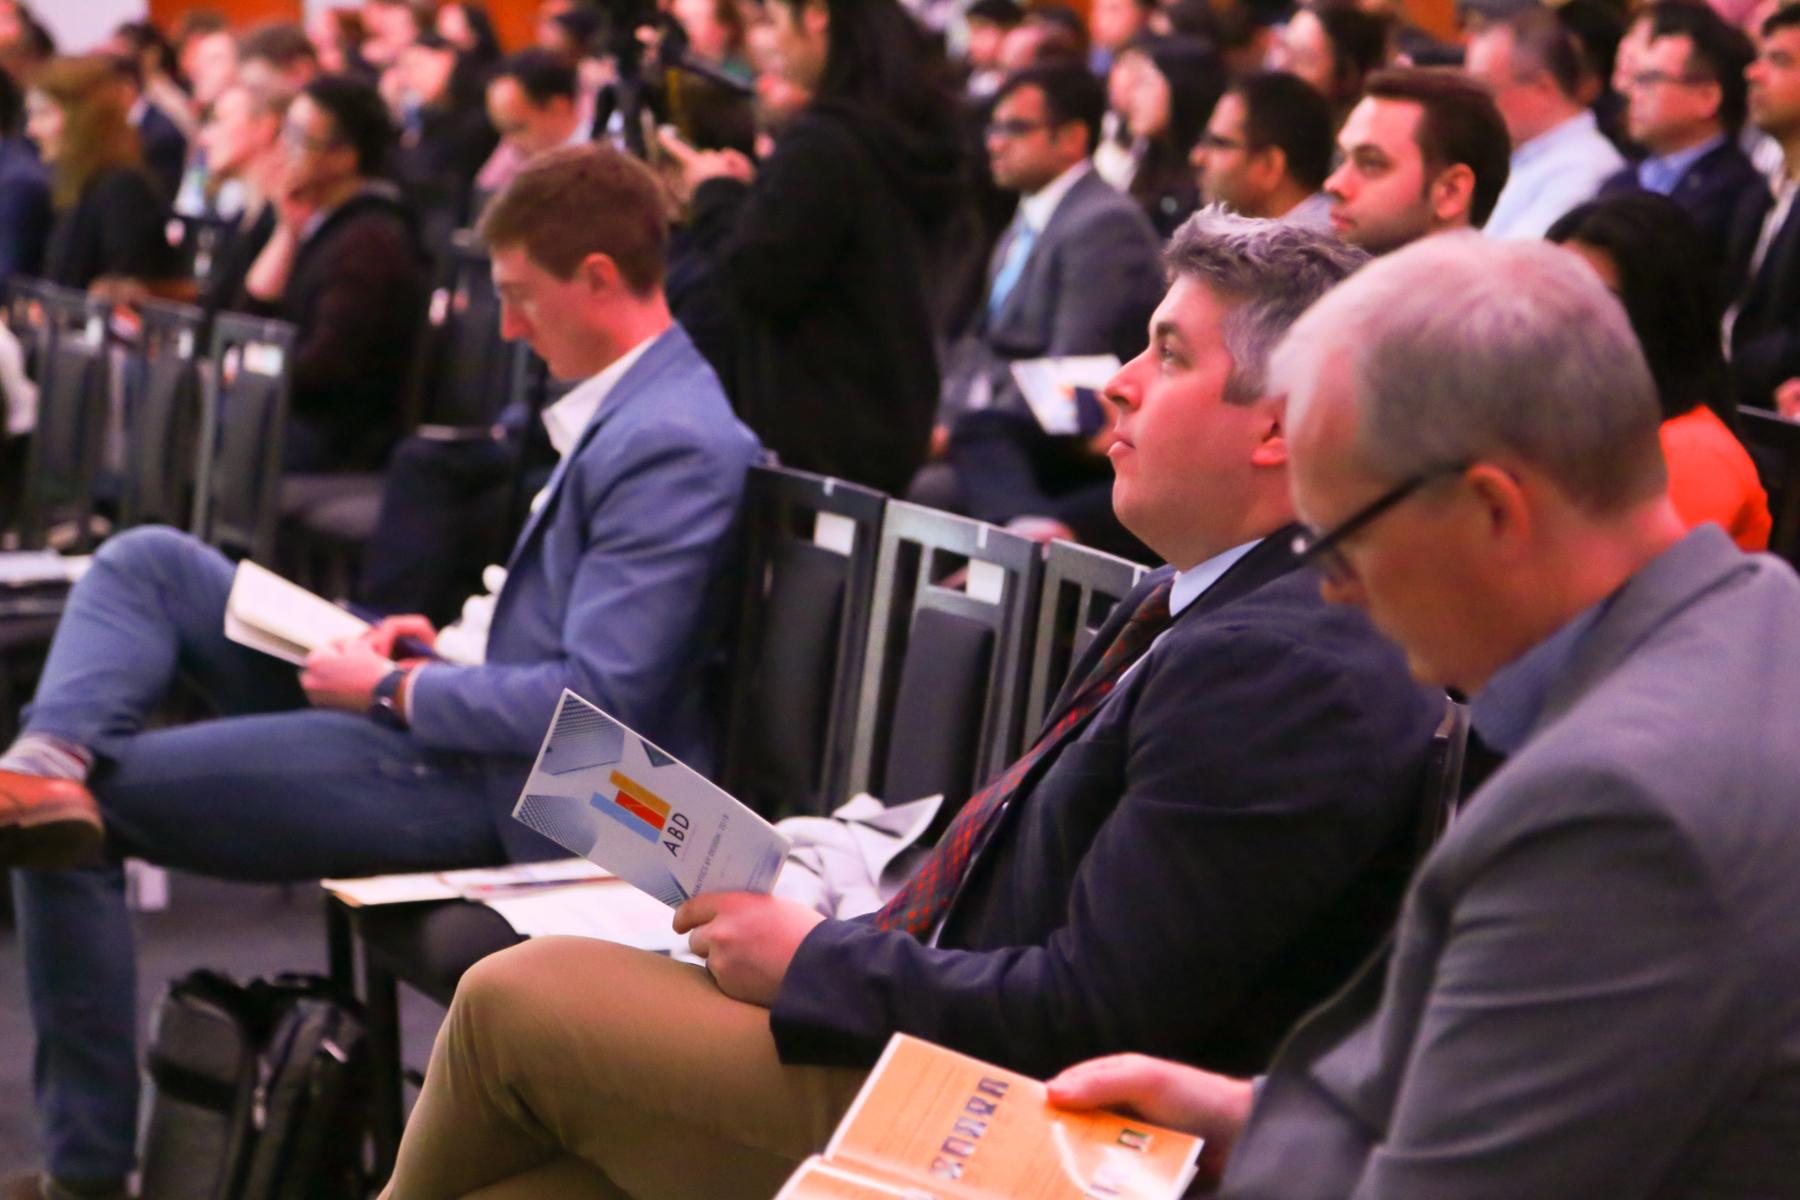 ABD_Conference_2018-058.jpg